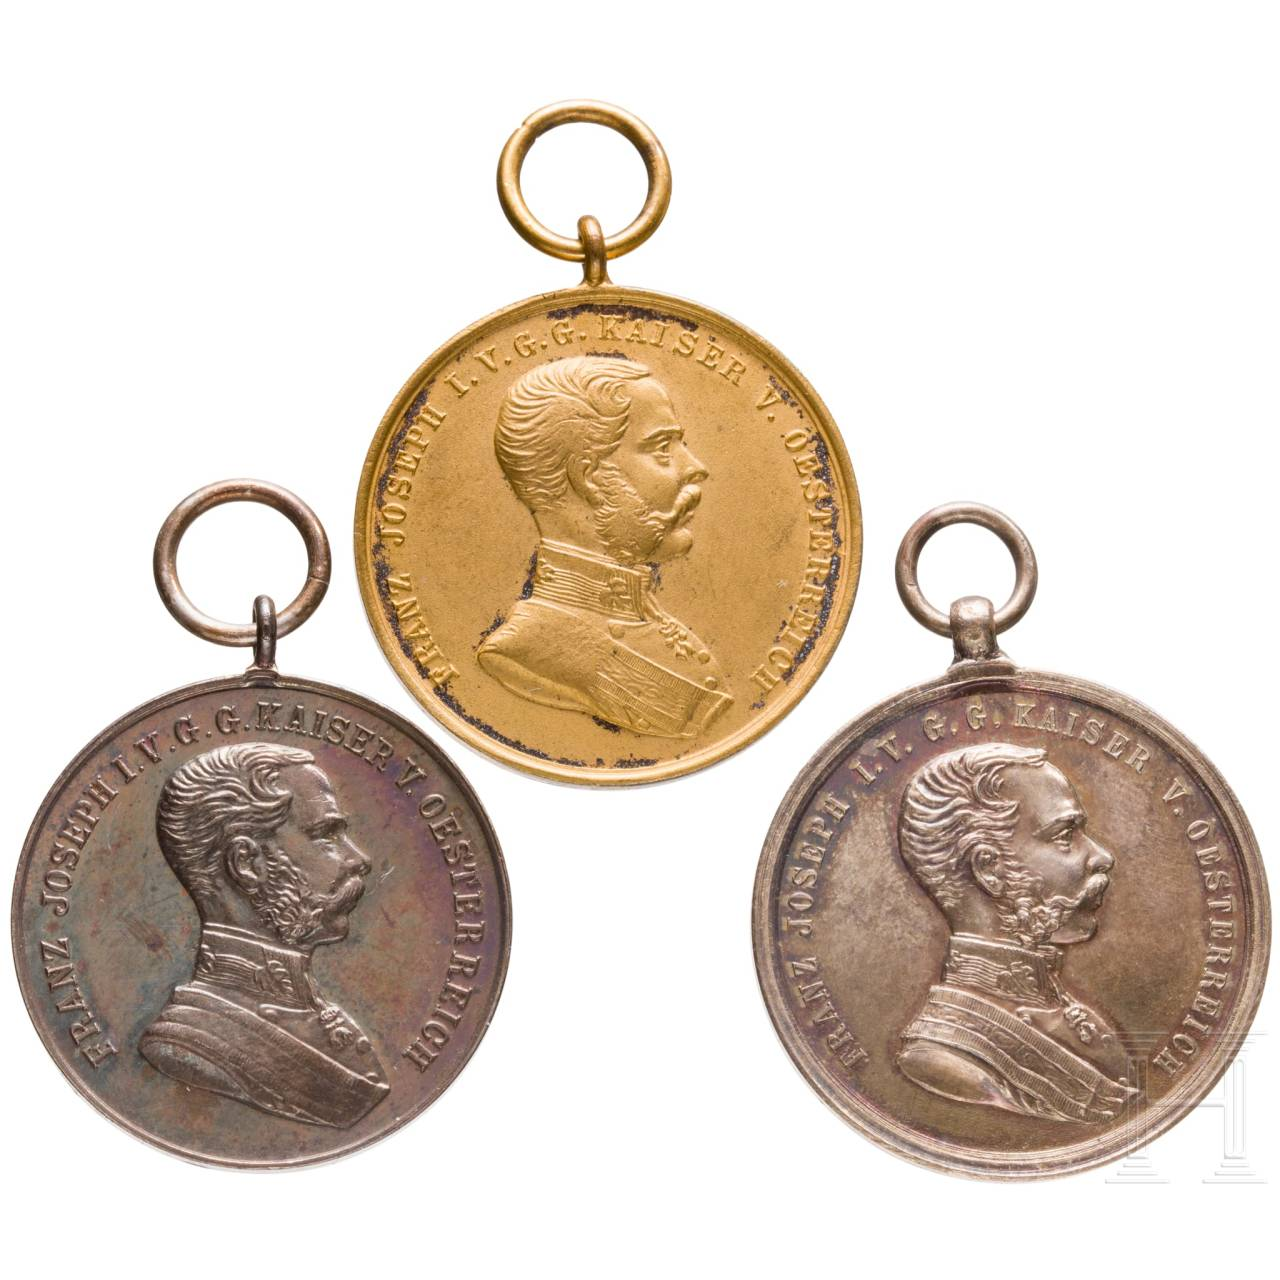 Medal for Bravery - three awards